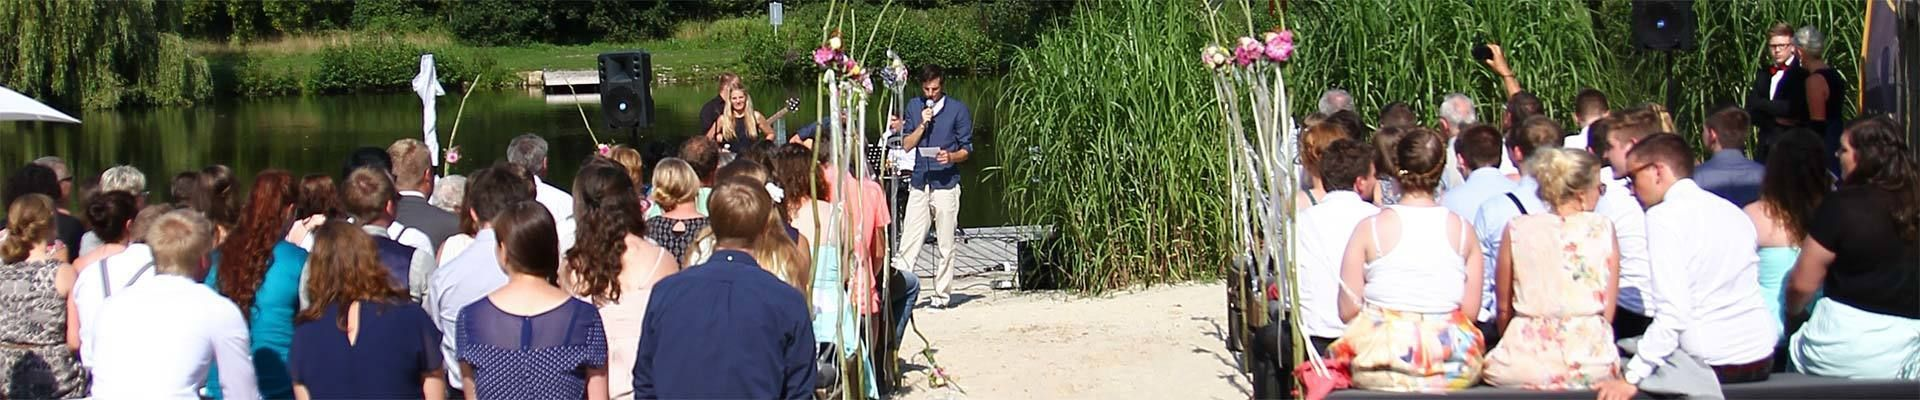 Feiern am Berkelsee | Offshore Berkelbeach